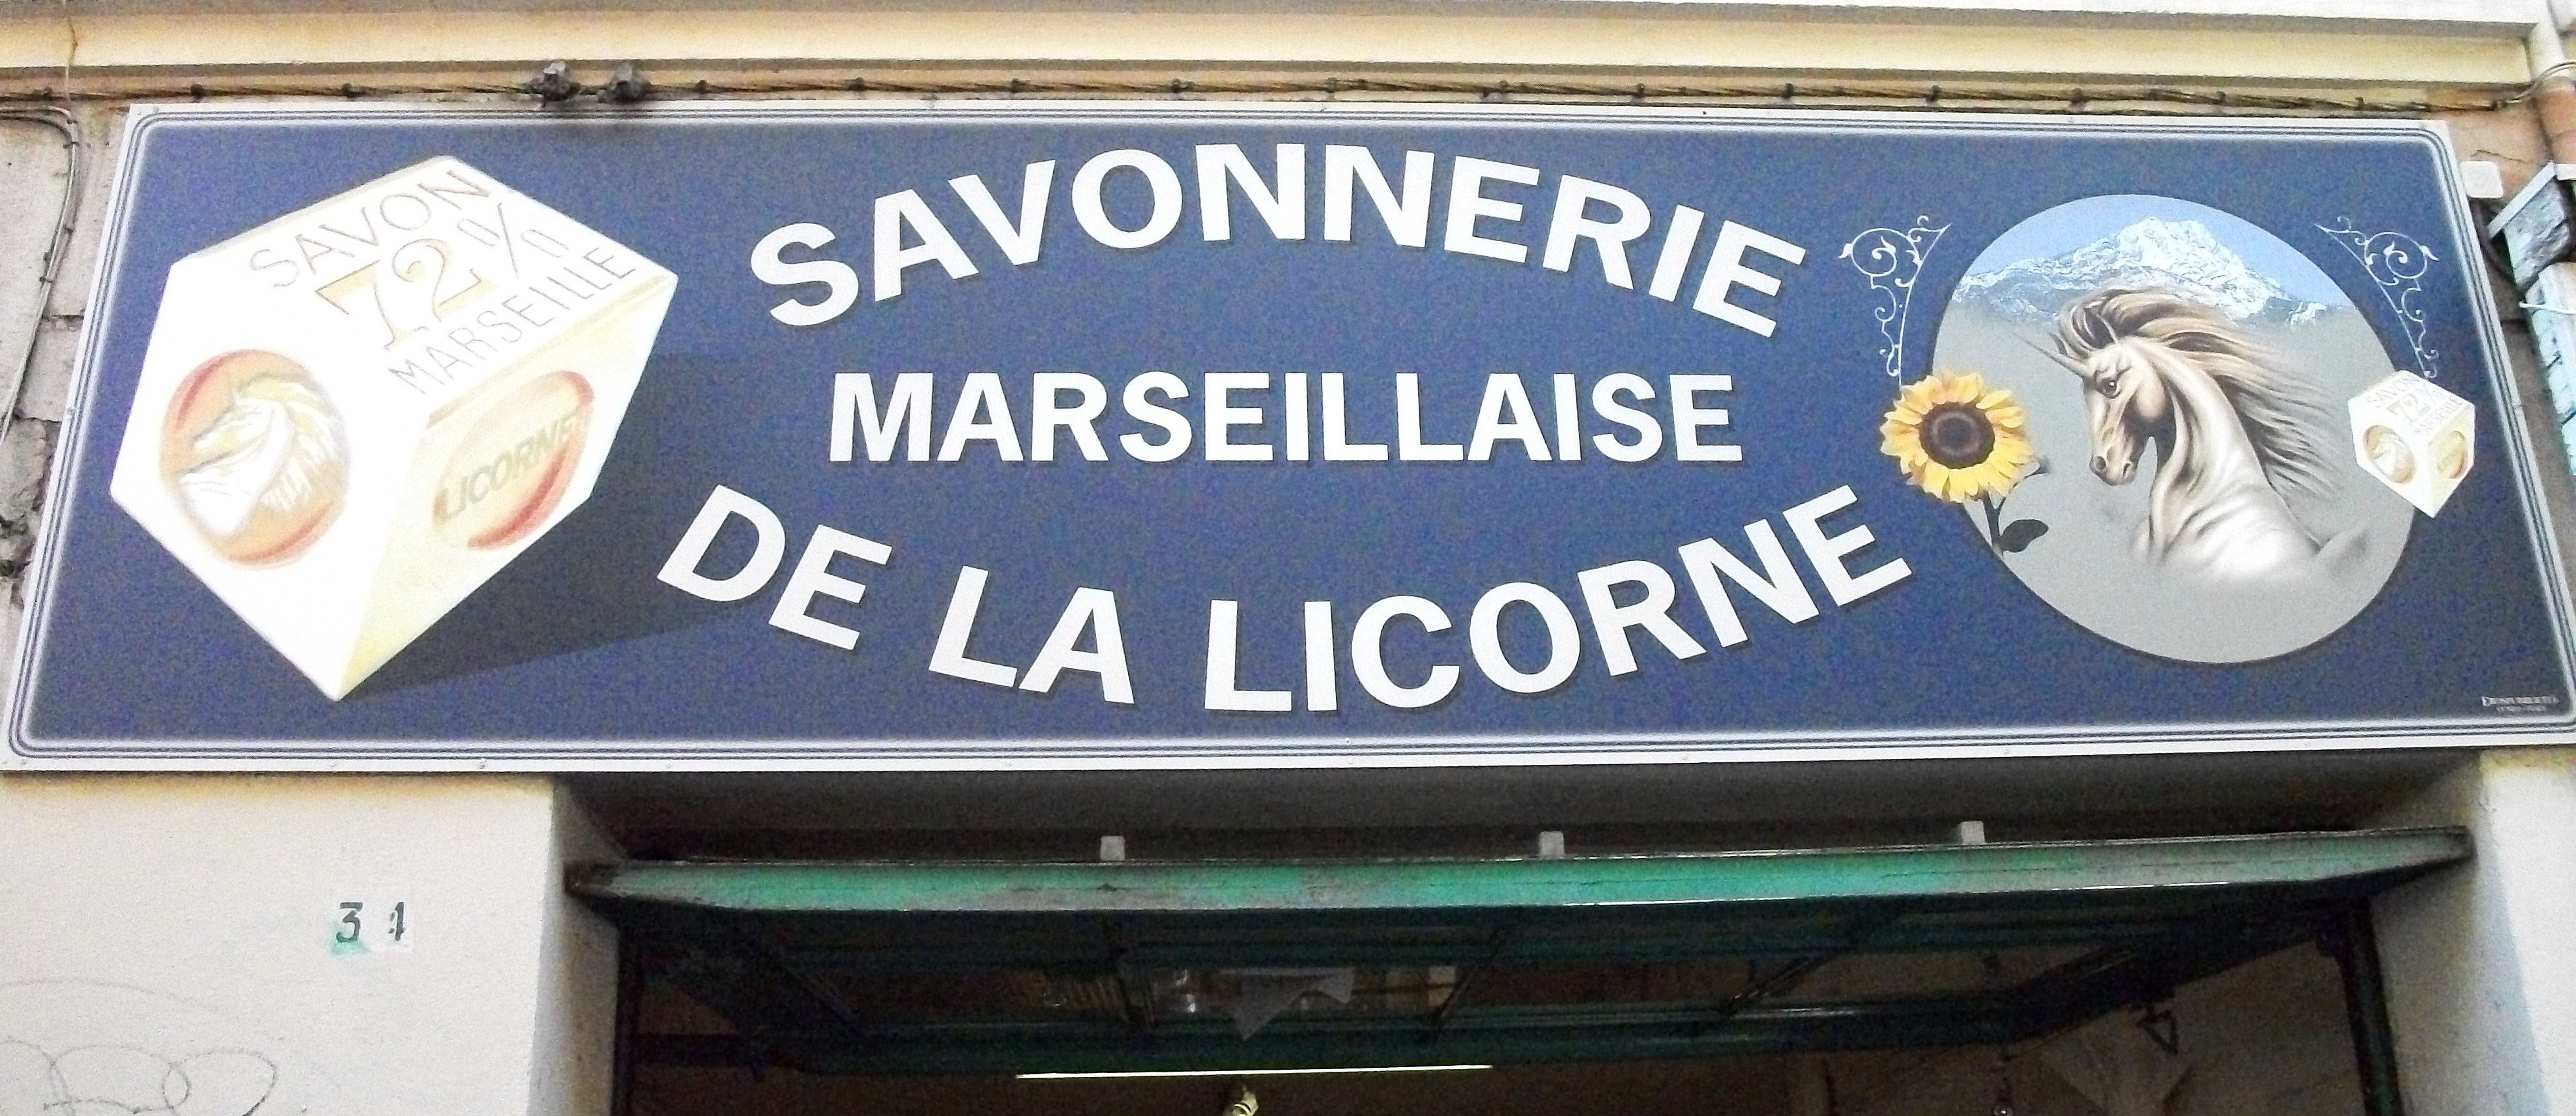 l'usine artisanale et familiale la Licorne